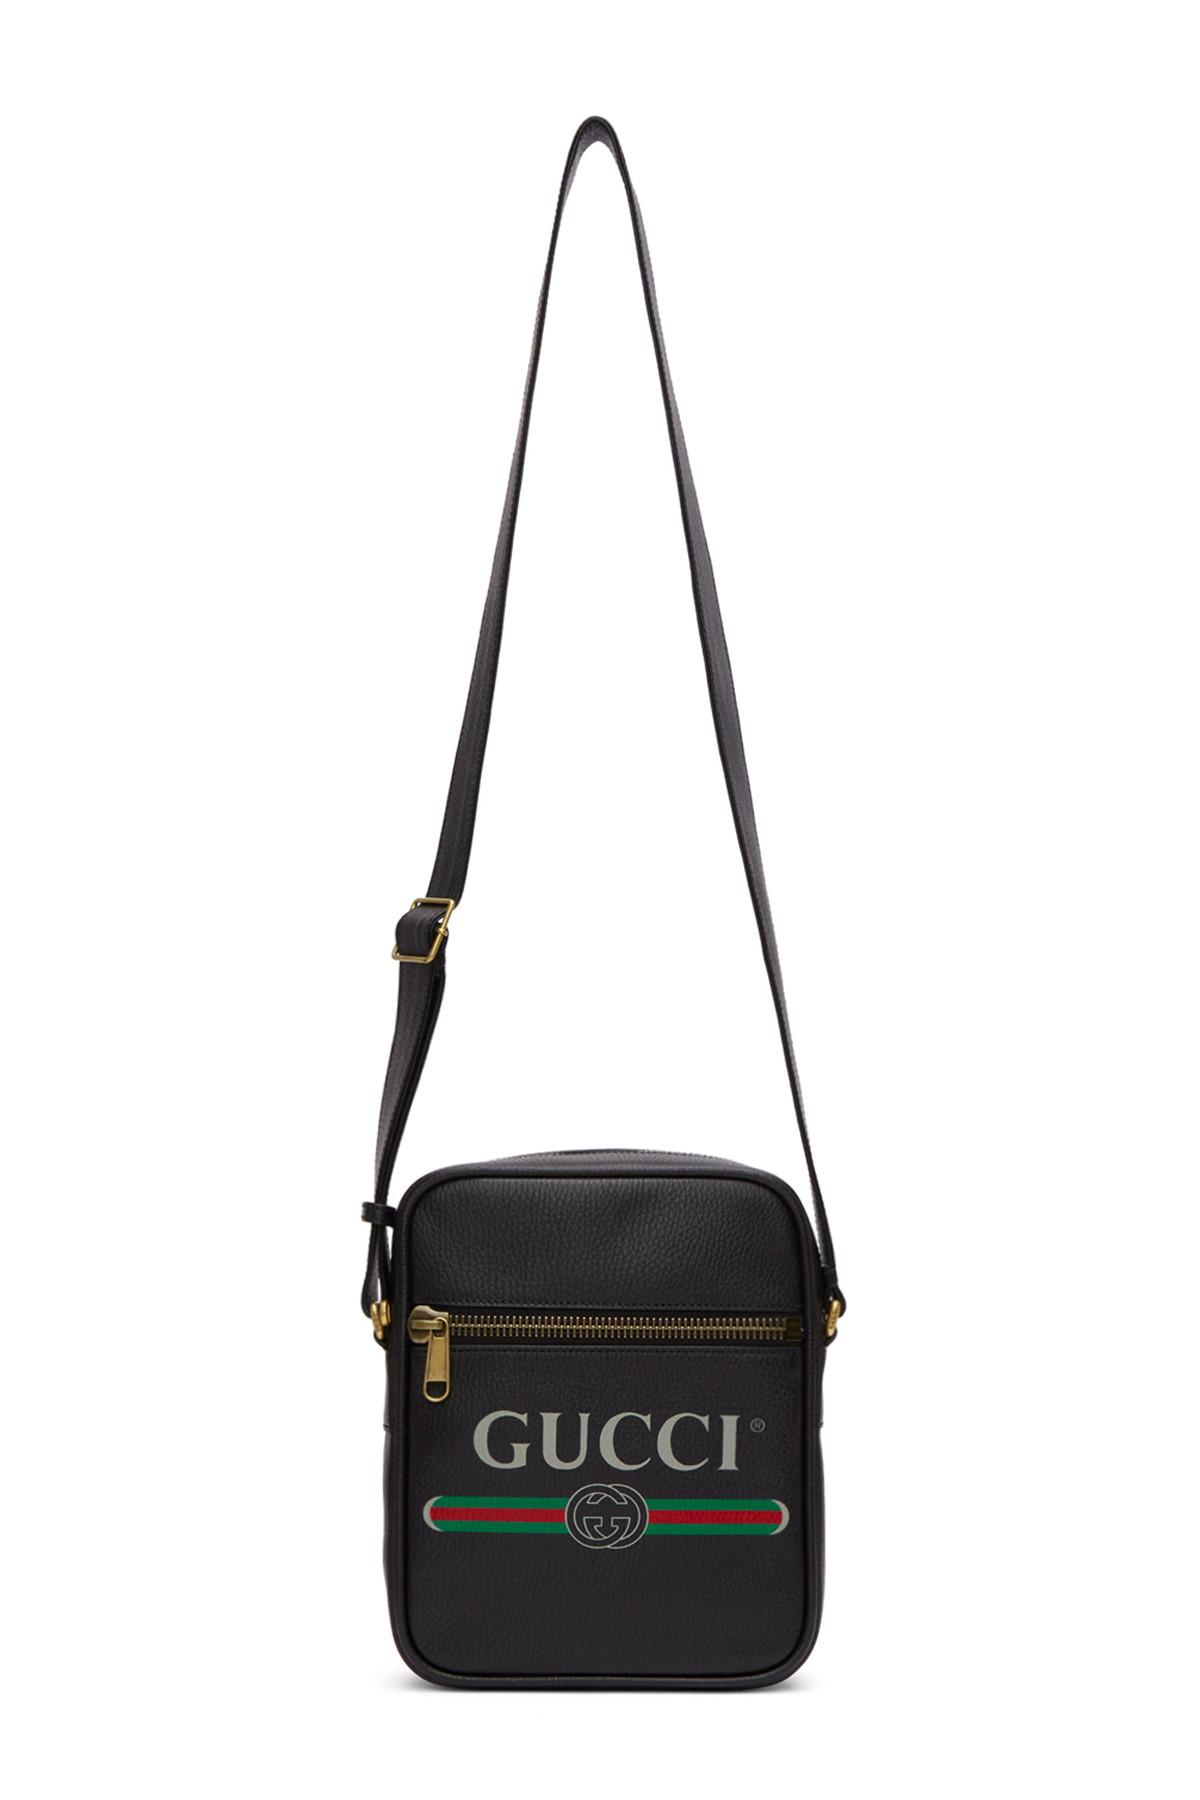 gucci-logo-ivory-messenger-bag-release-a